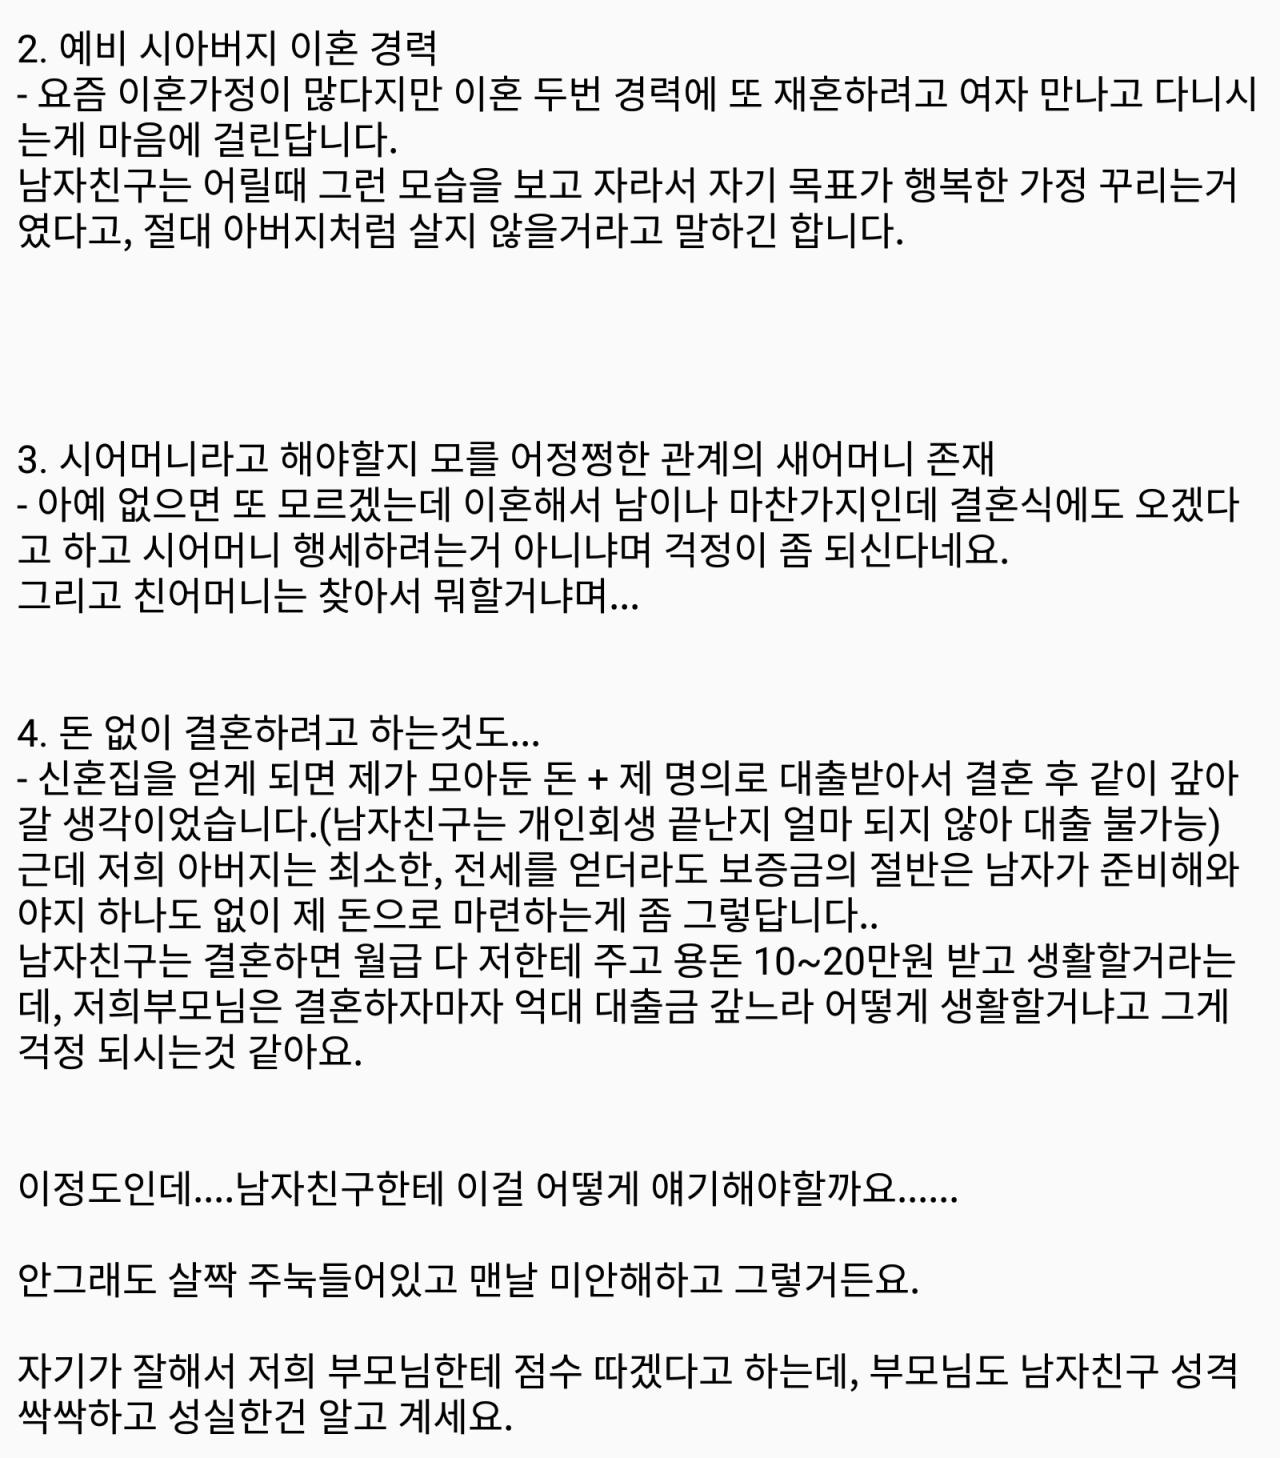 IMG_20180515_133454.png 현재 엠팍에서 댓글 500개 넘긴 예비신부 사연.jpg